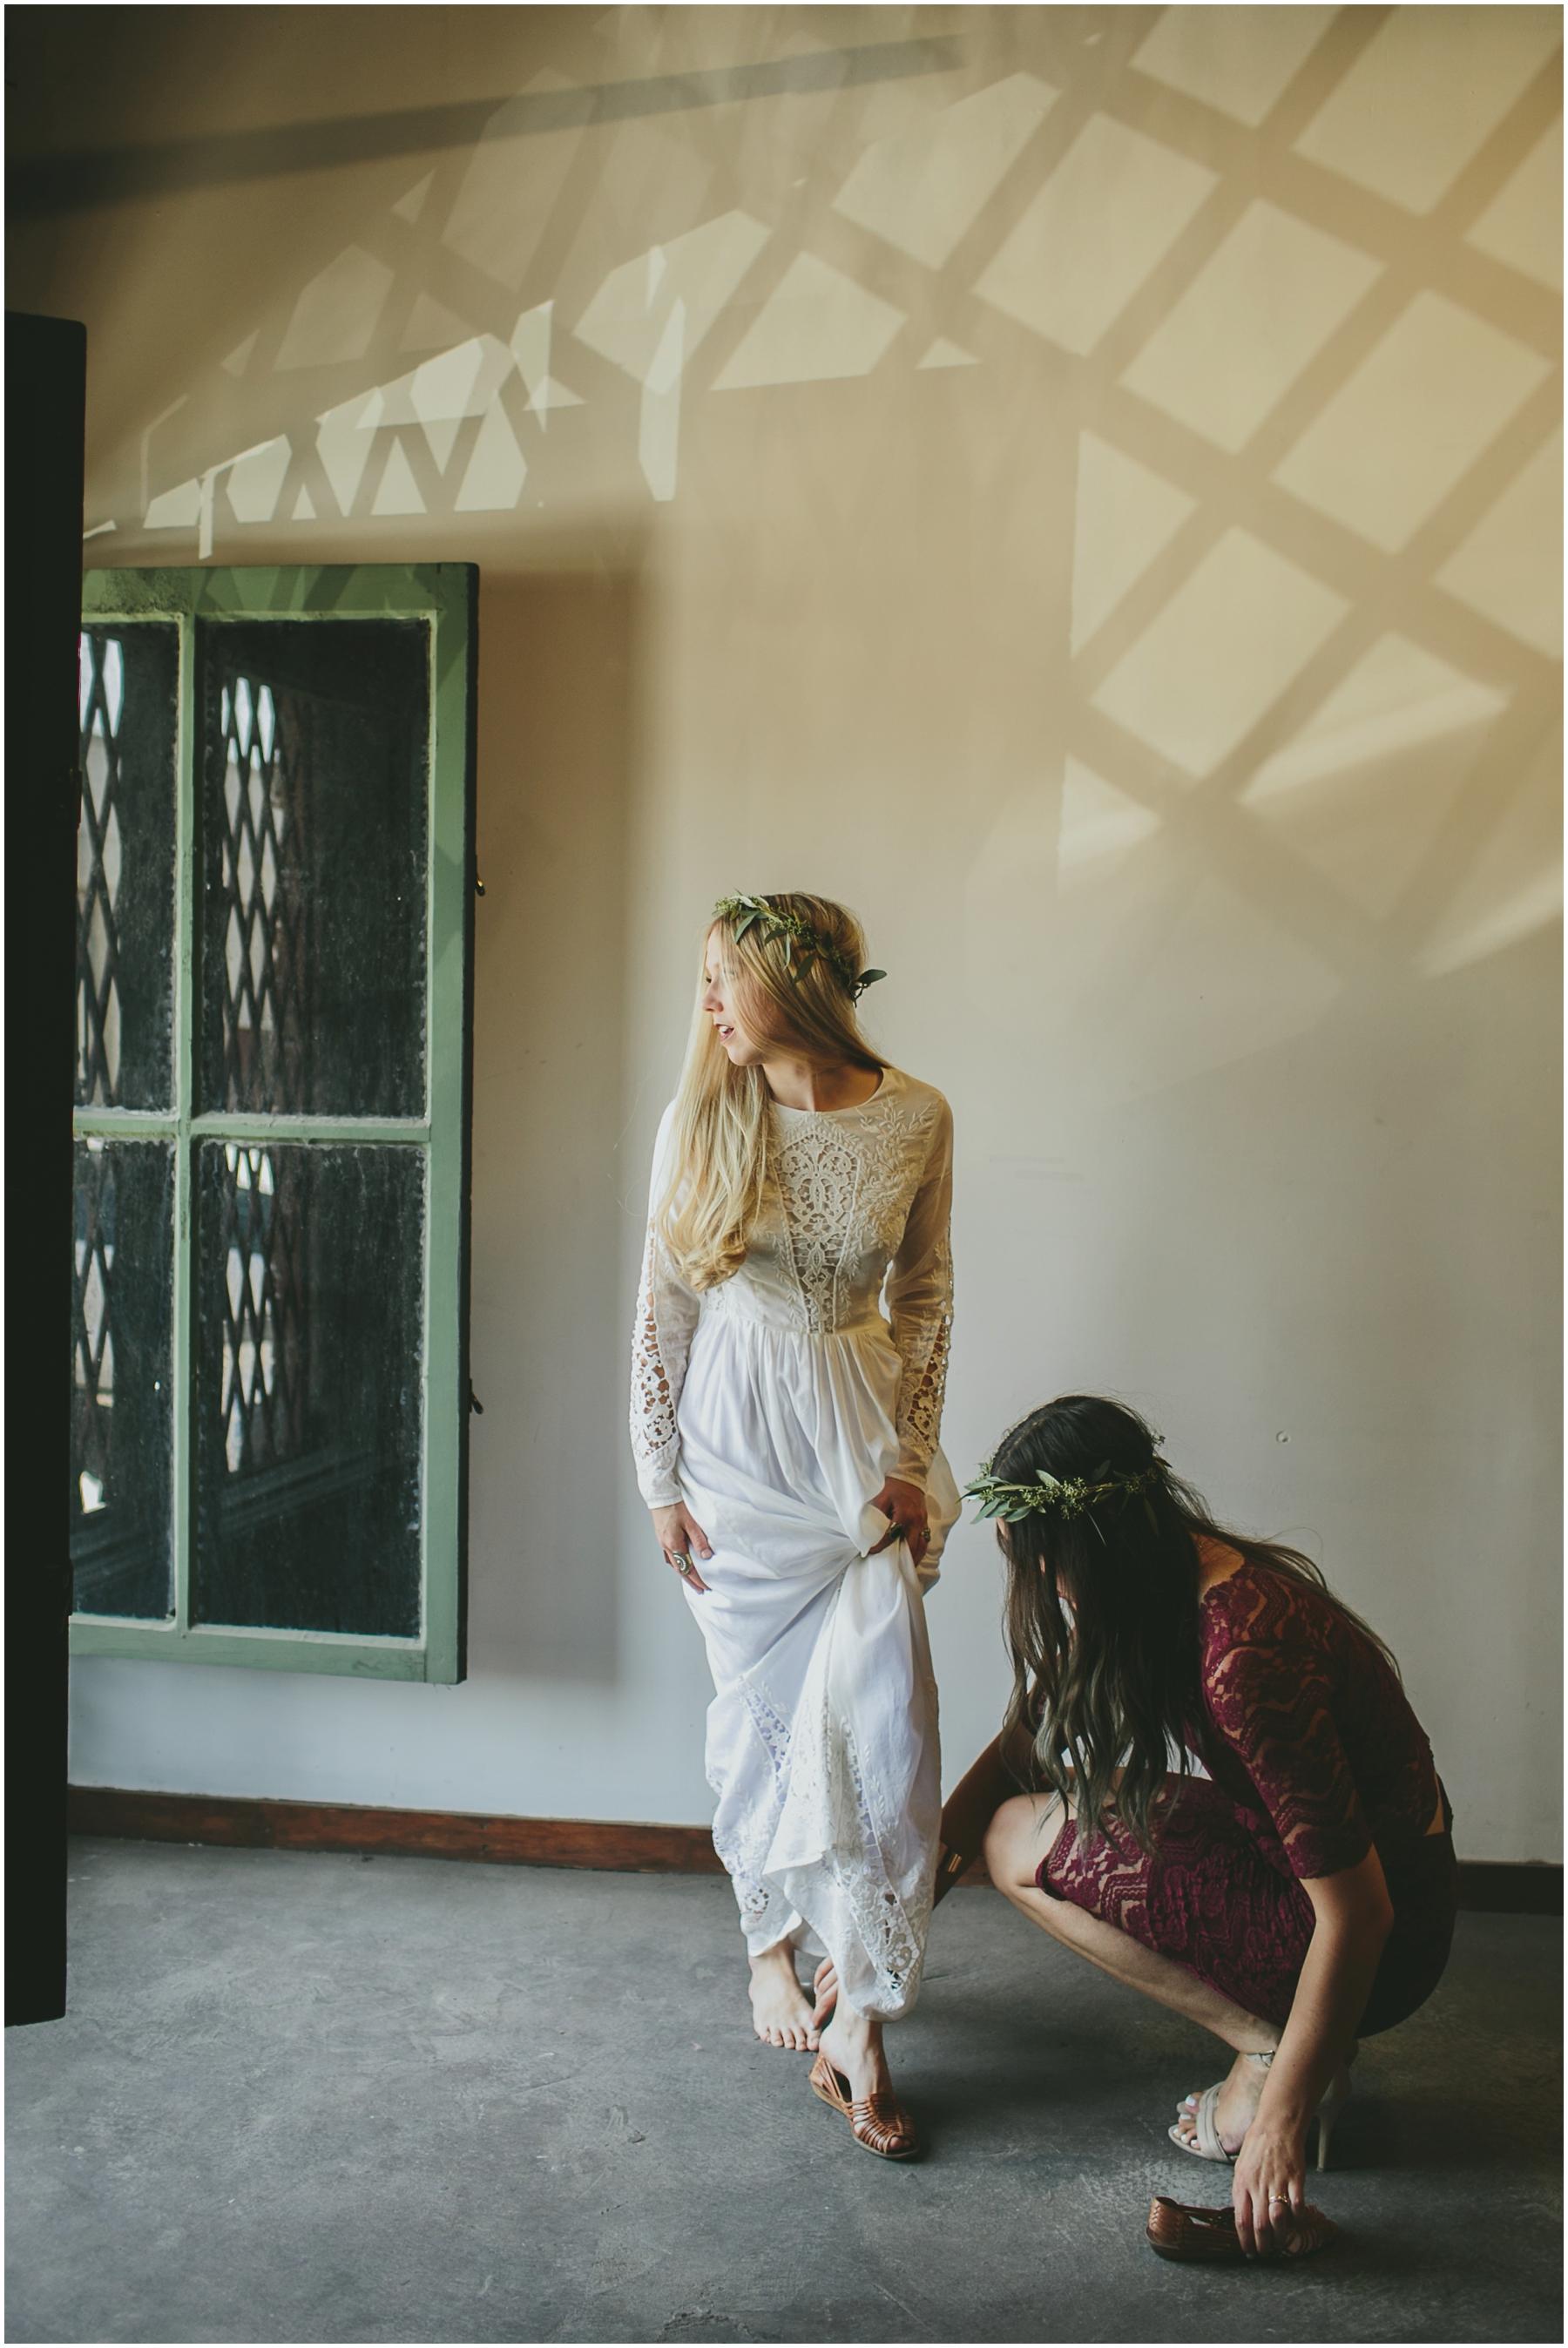 Natalie+Corey-WEDDING_KELLYBOITANO_0011